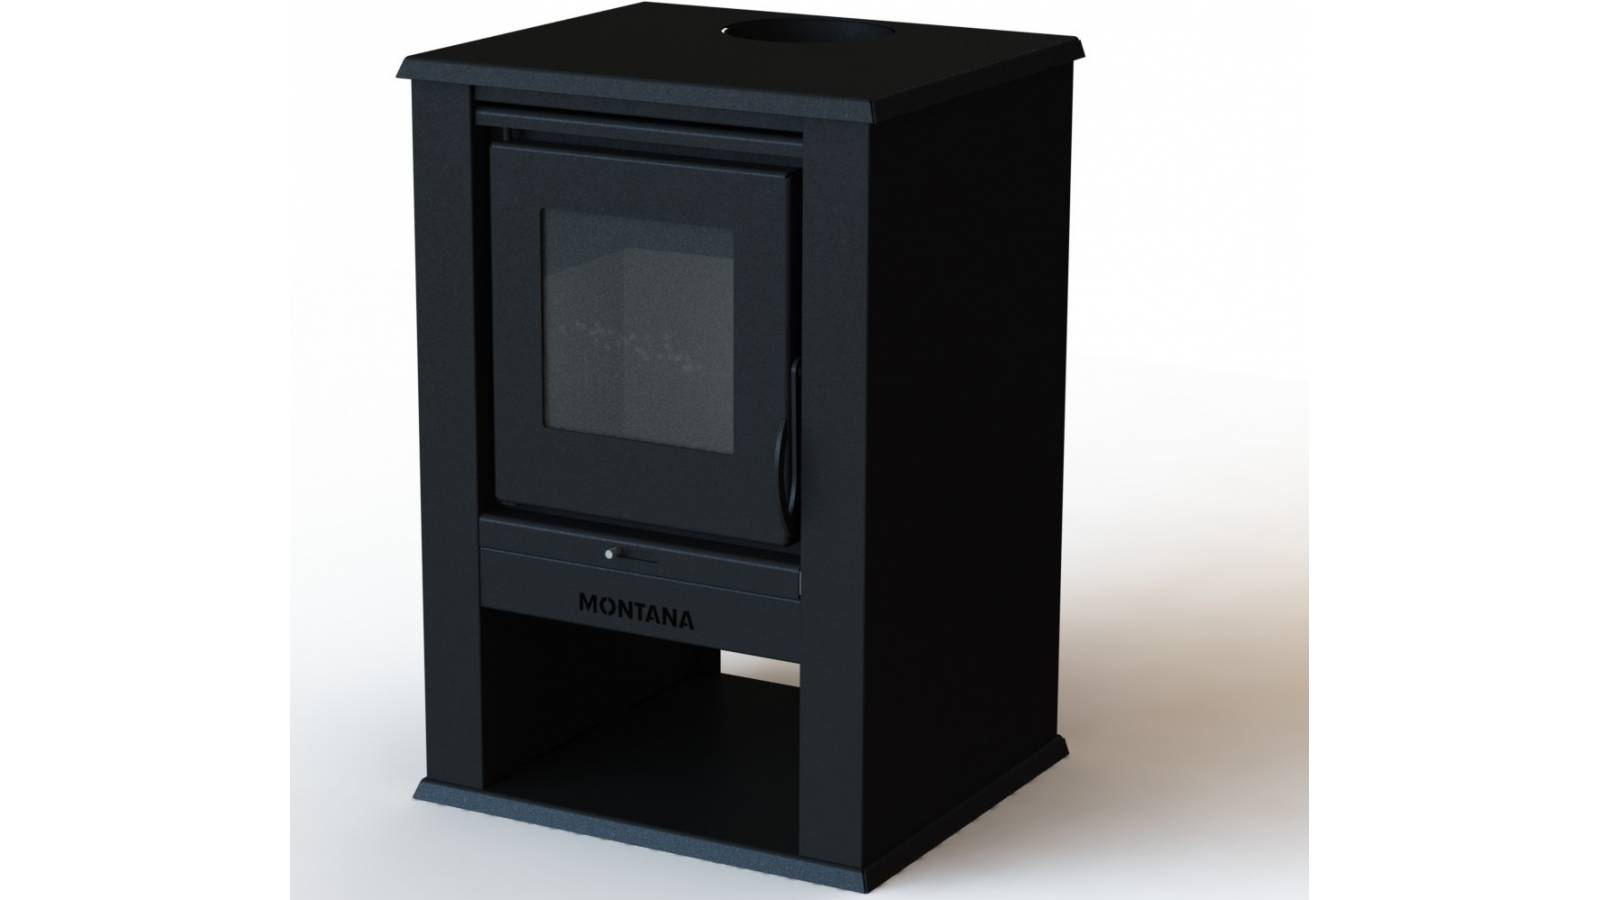 Estufa calefaccion a leña 12 KW - Cubre hasta 124 m2